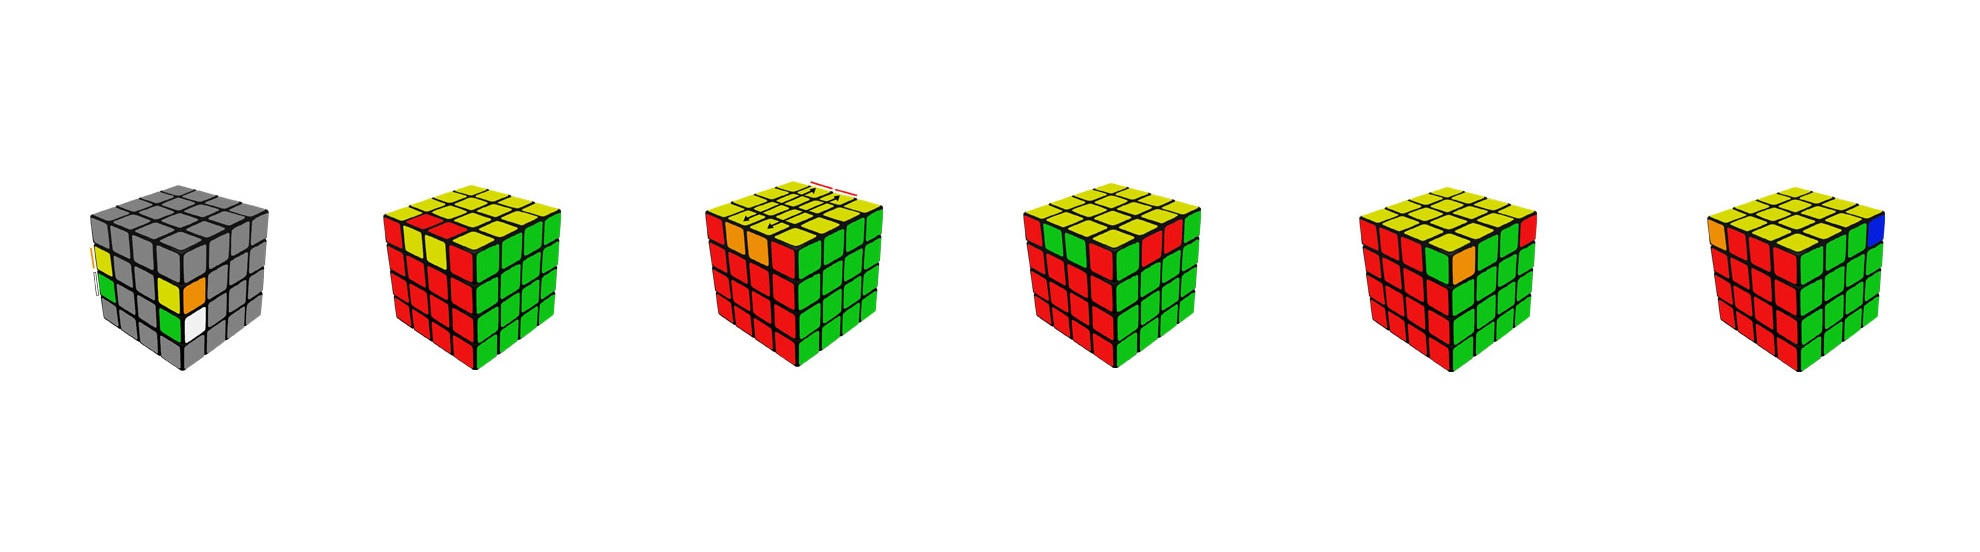 4x4 paridades